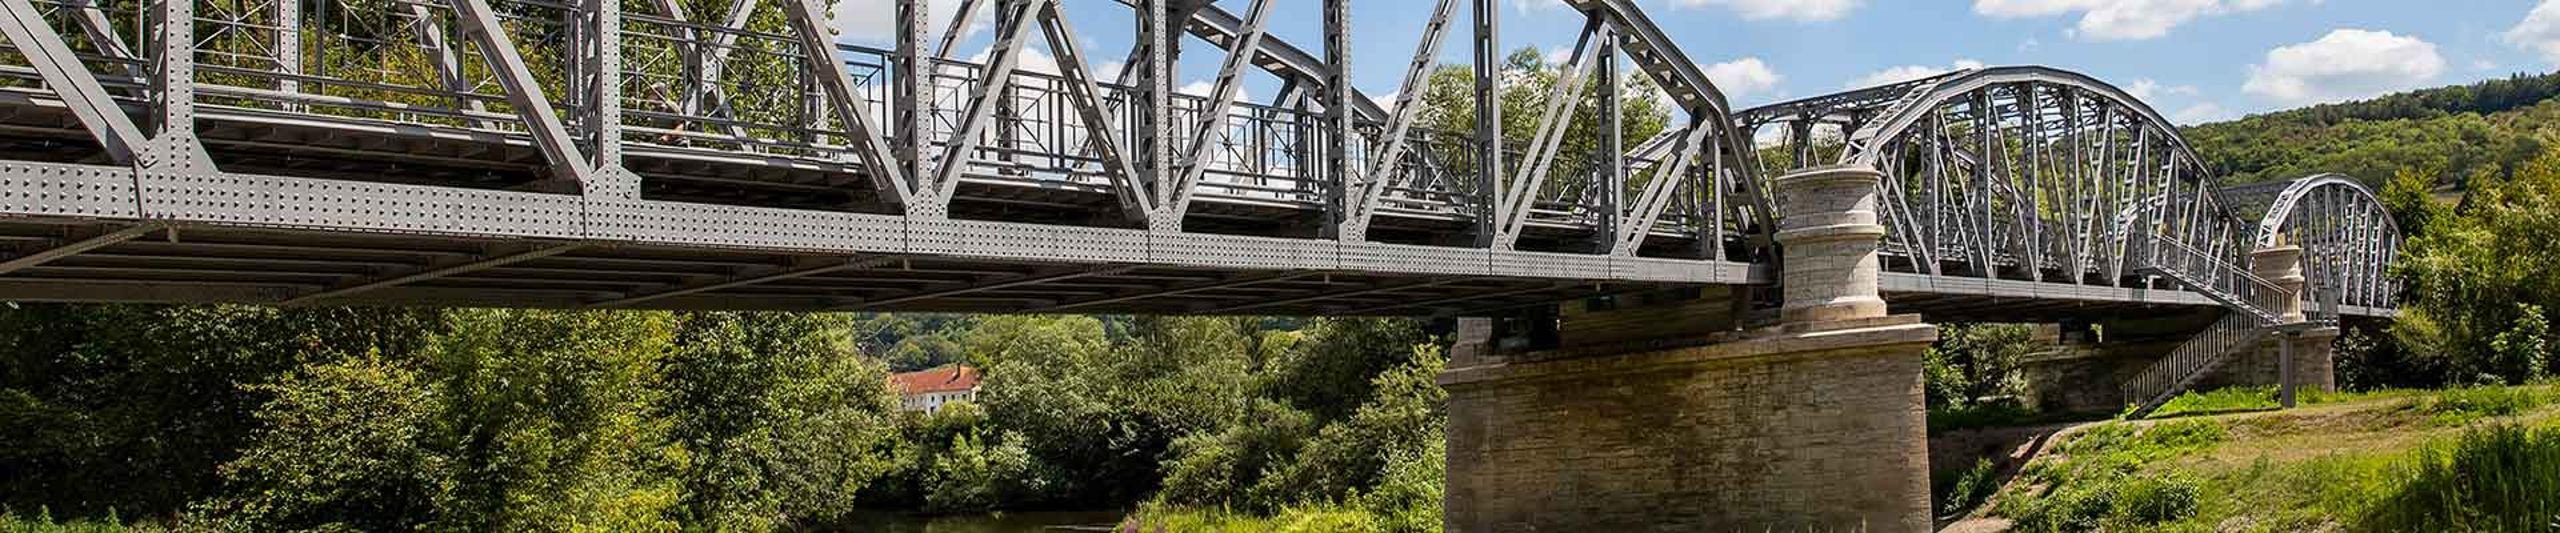 Bauwerksinstandsetzung: Brücken & Parkhäuser